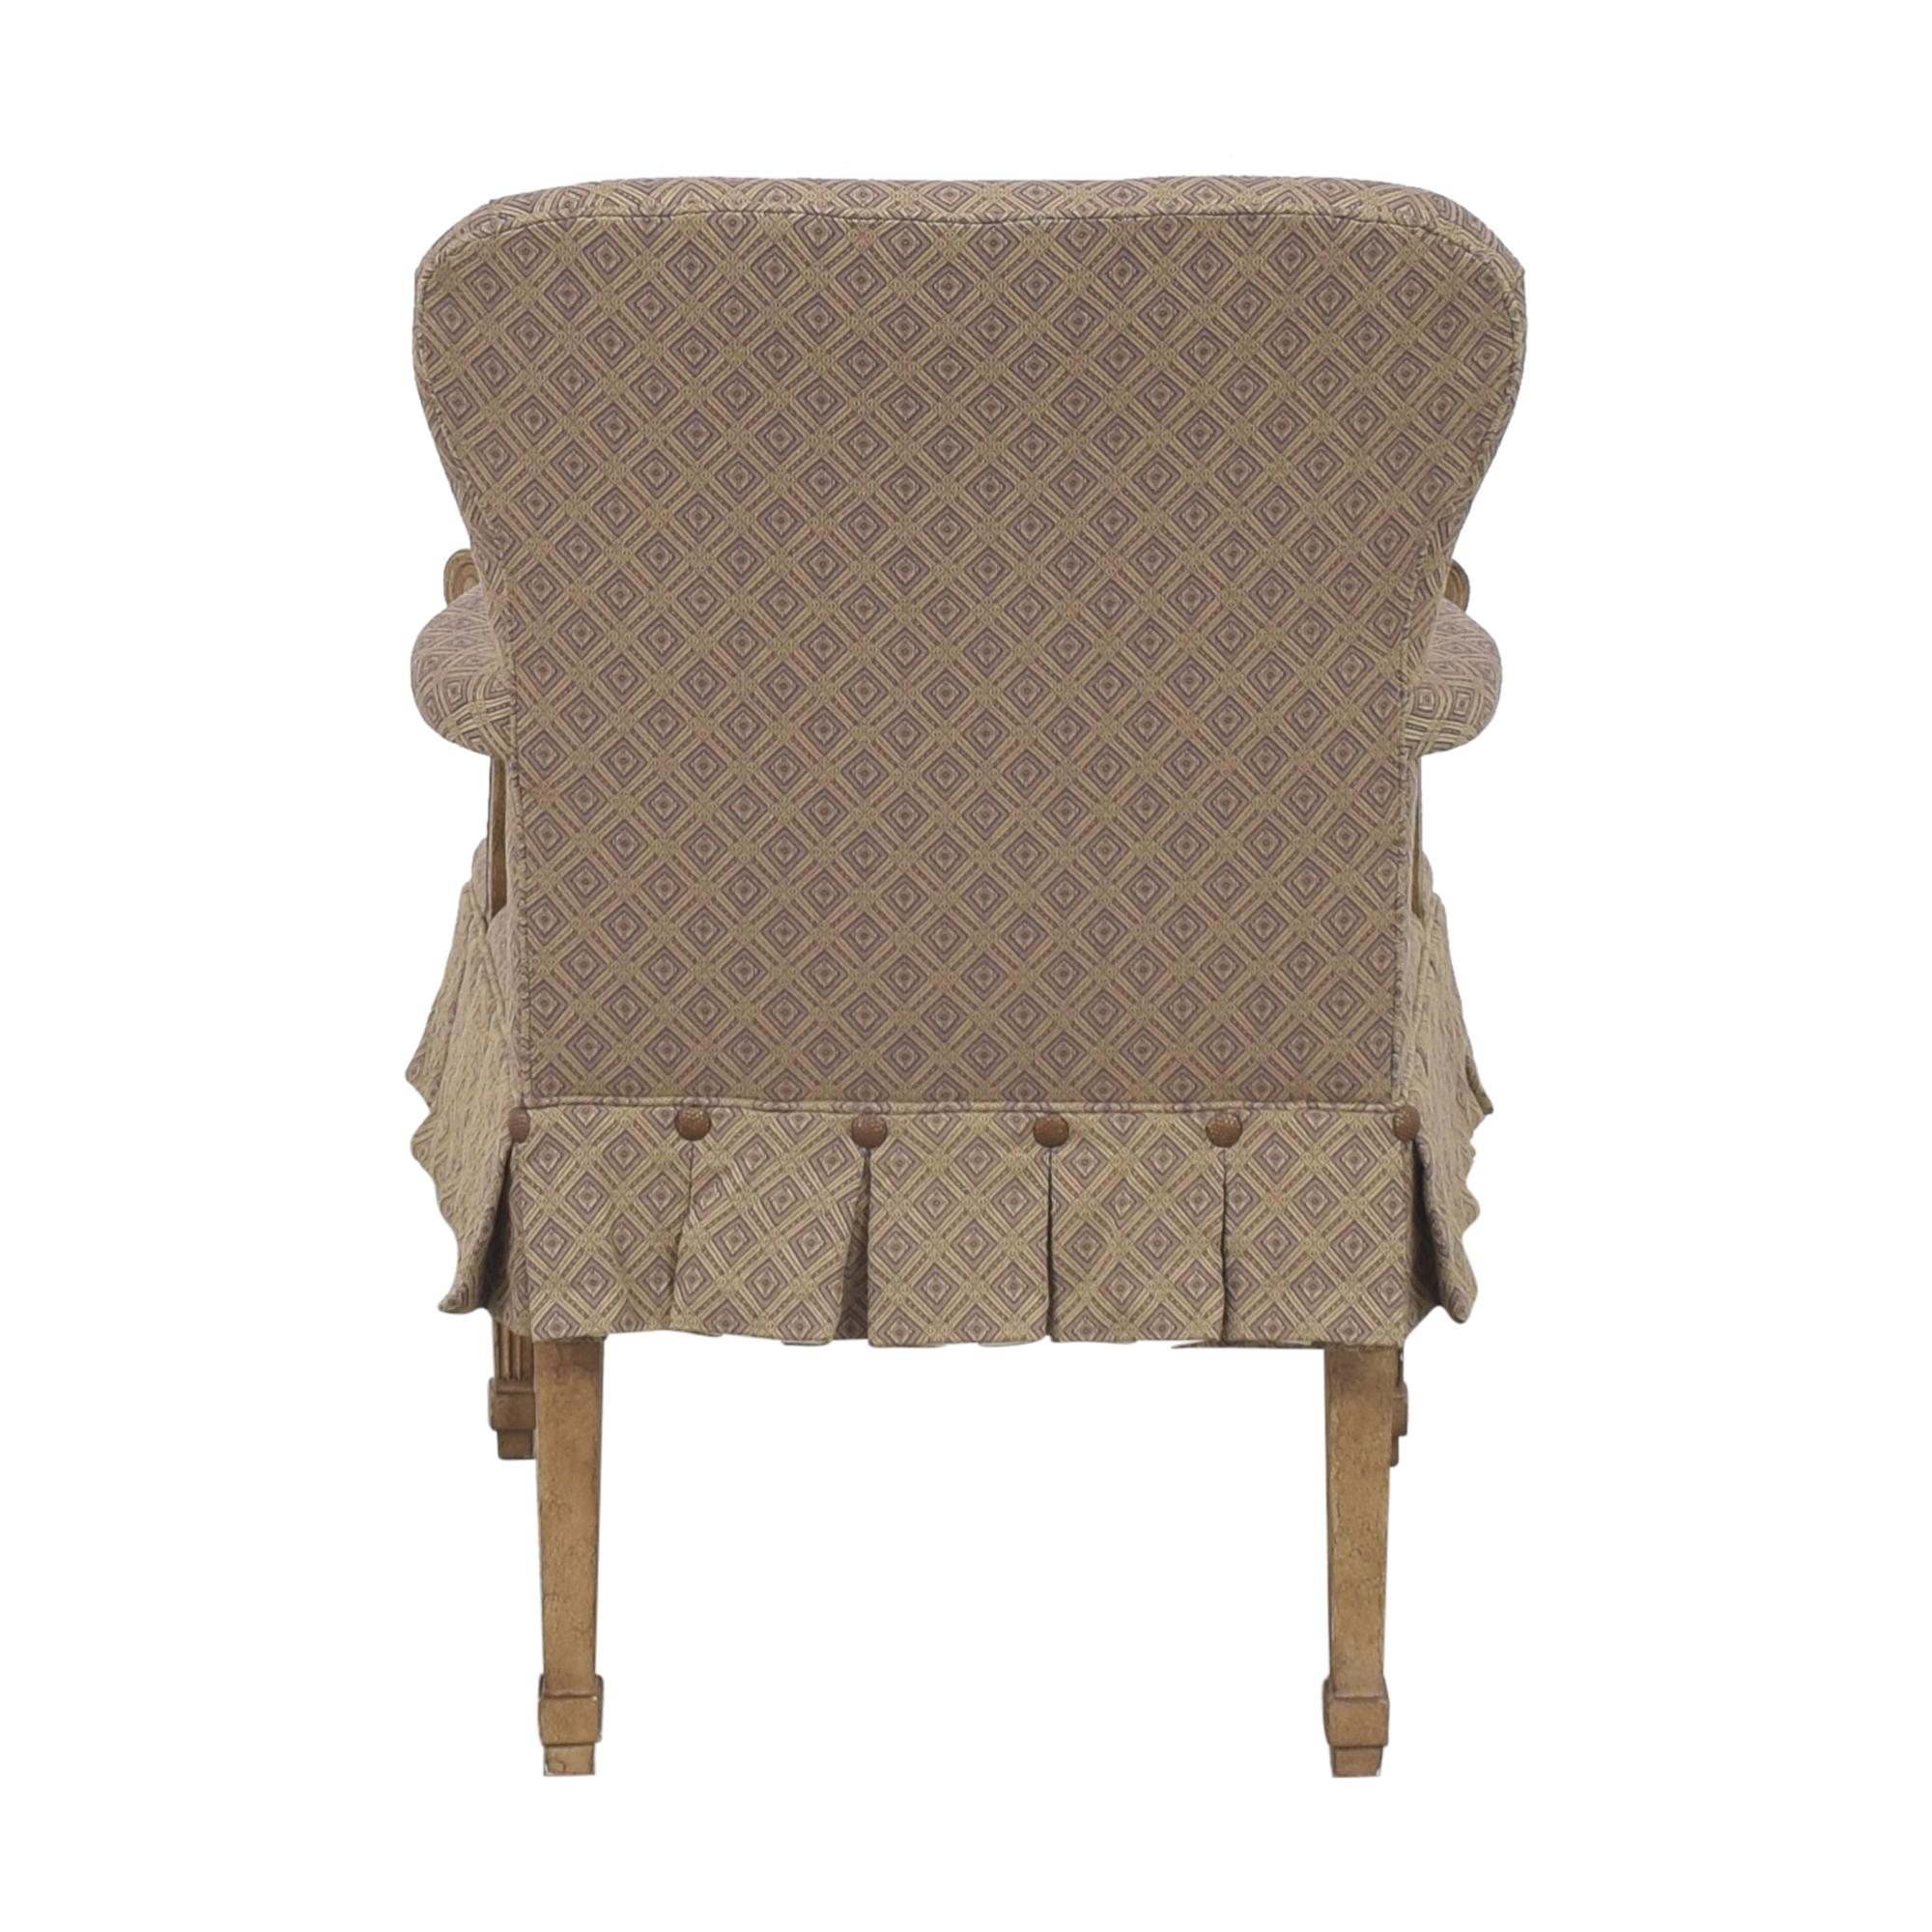 Kravet Kravet Pleated Accent Chair beige & brown